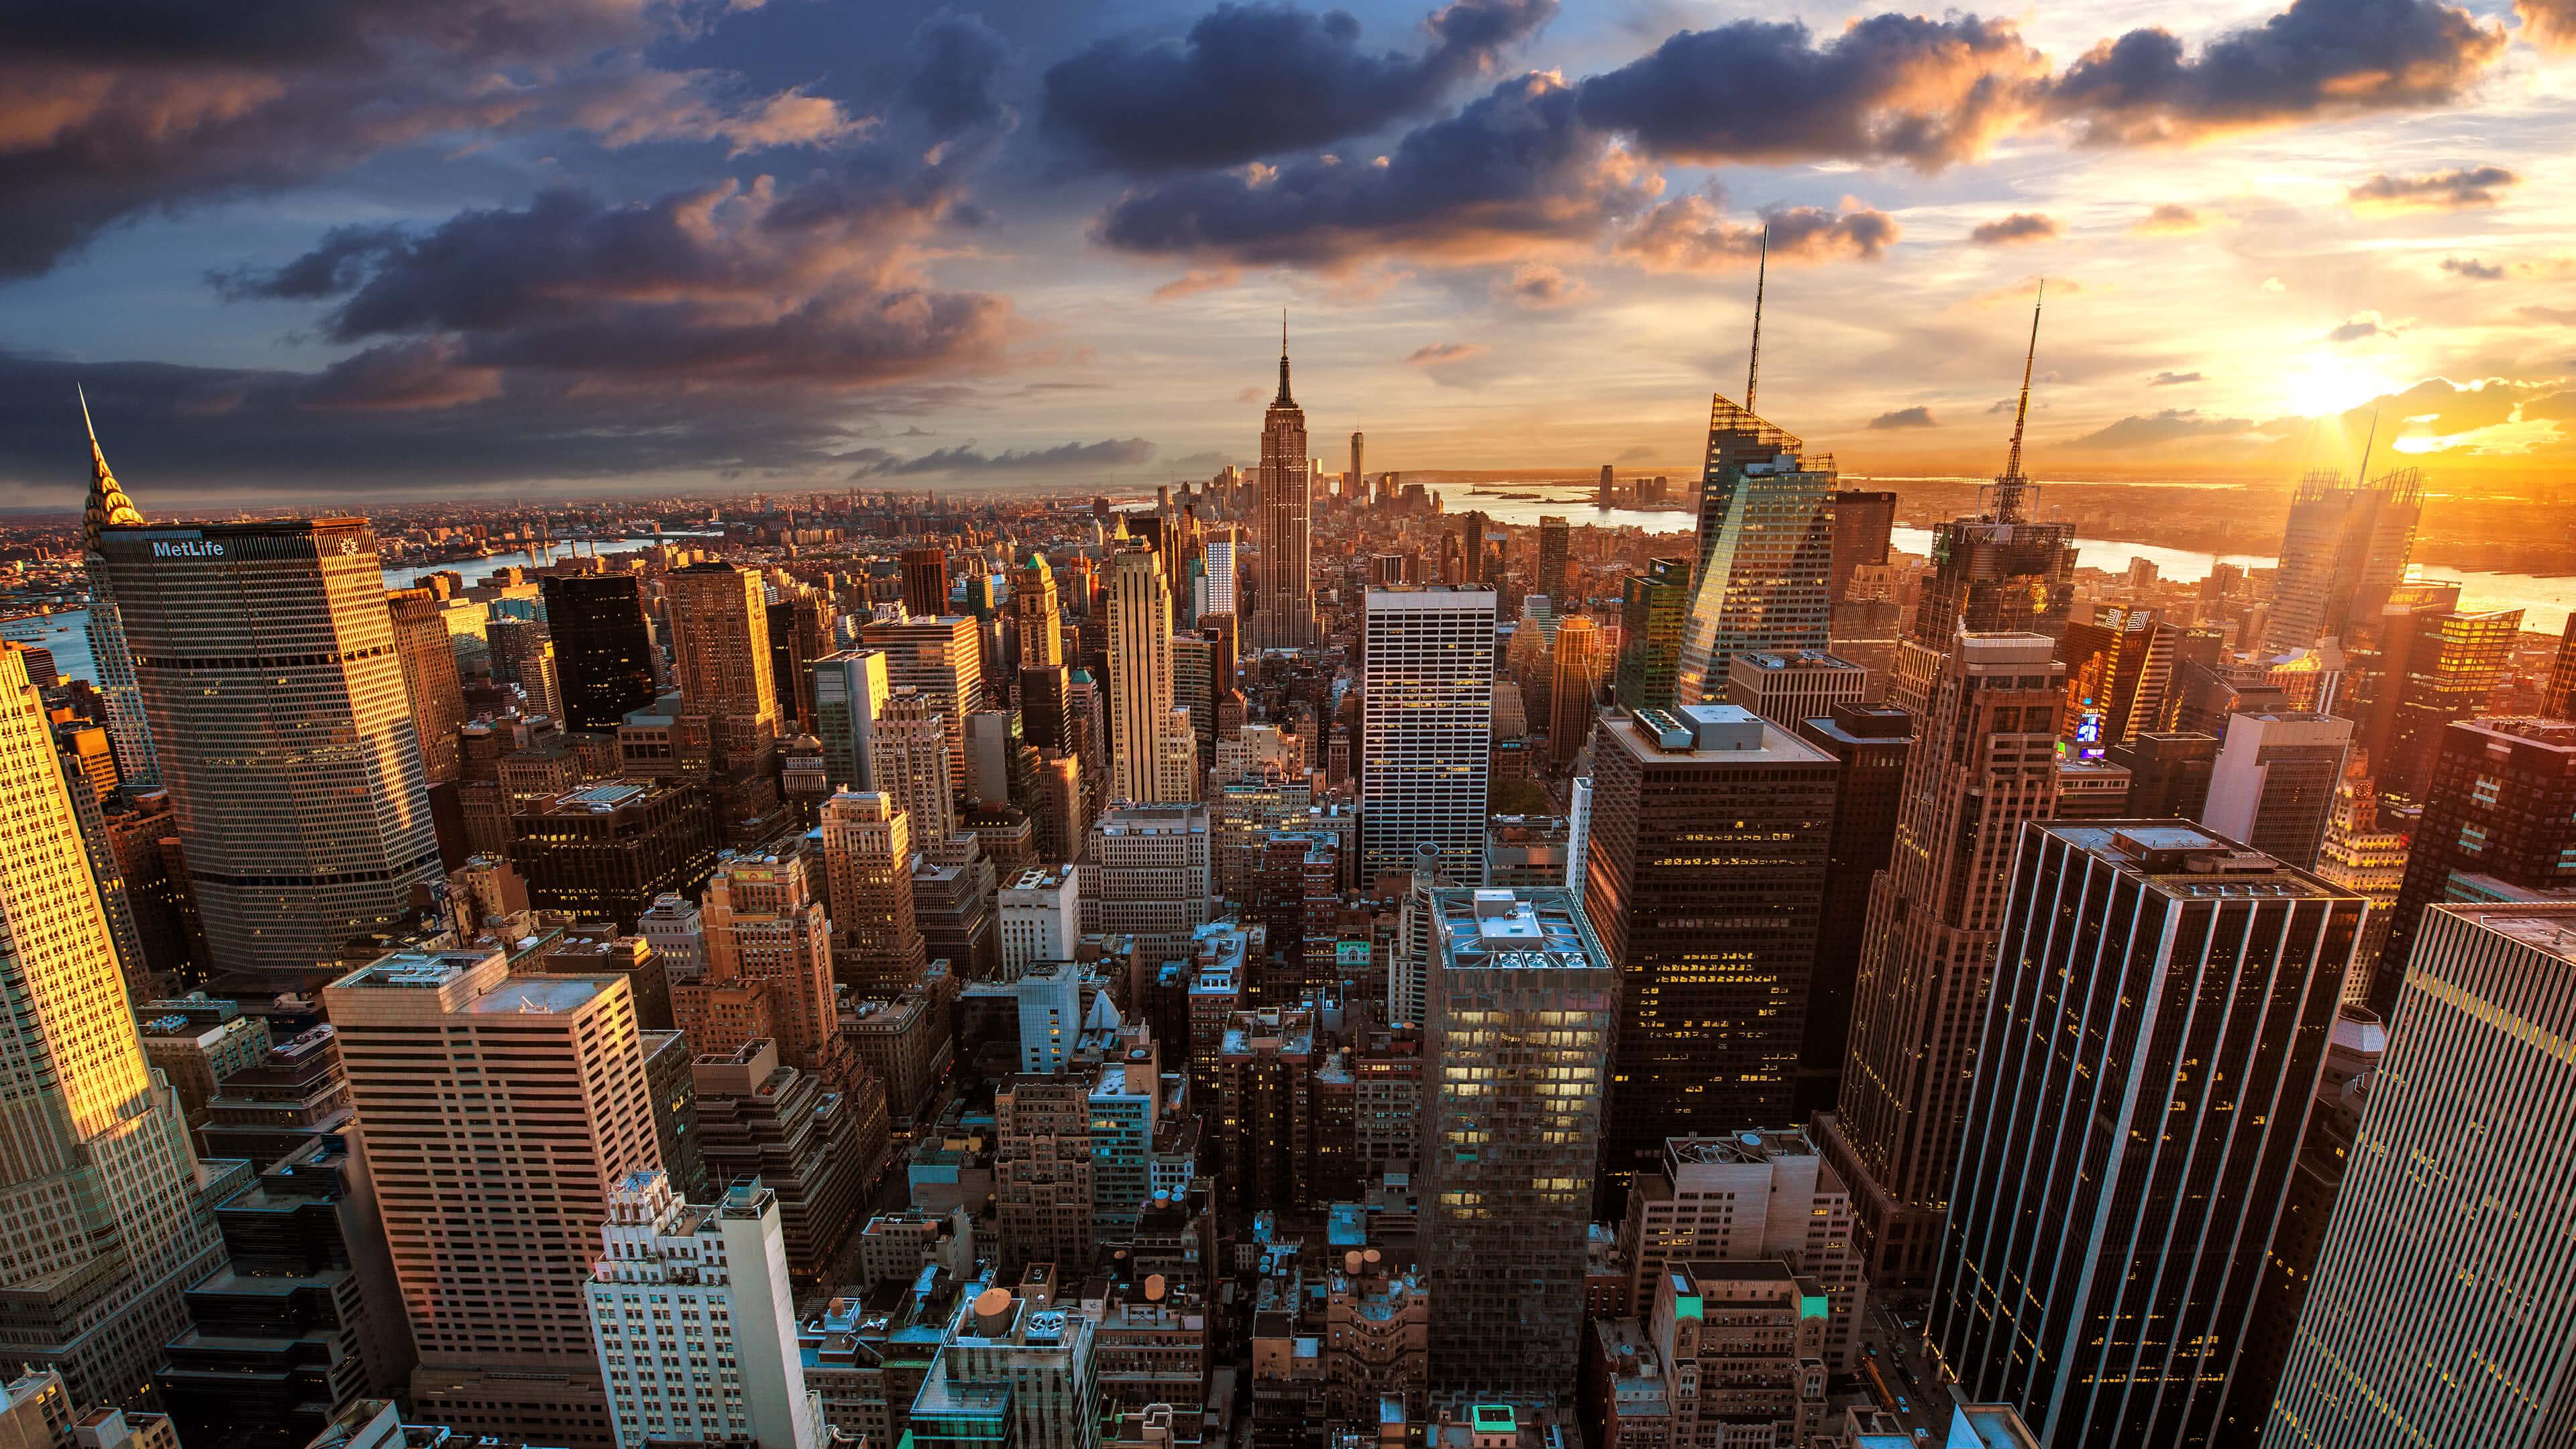 New York Cityscape Sunset UHD 4K Wallpaper Pixelz 3840x2160